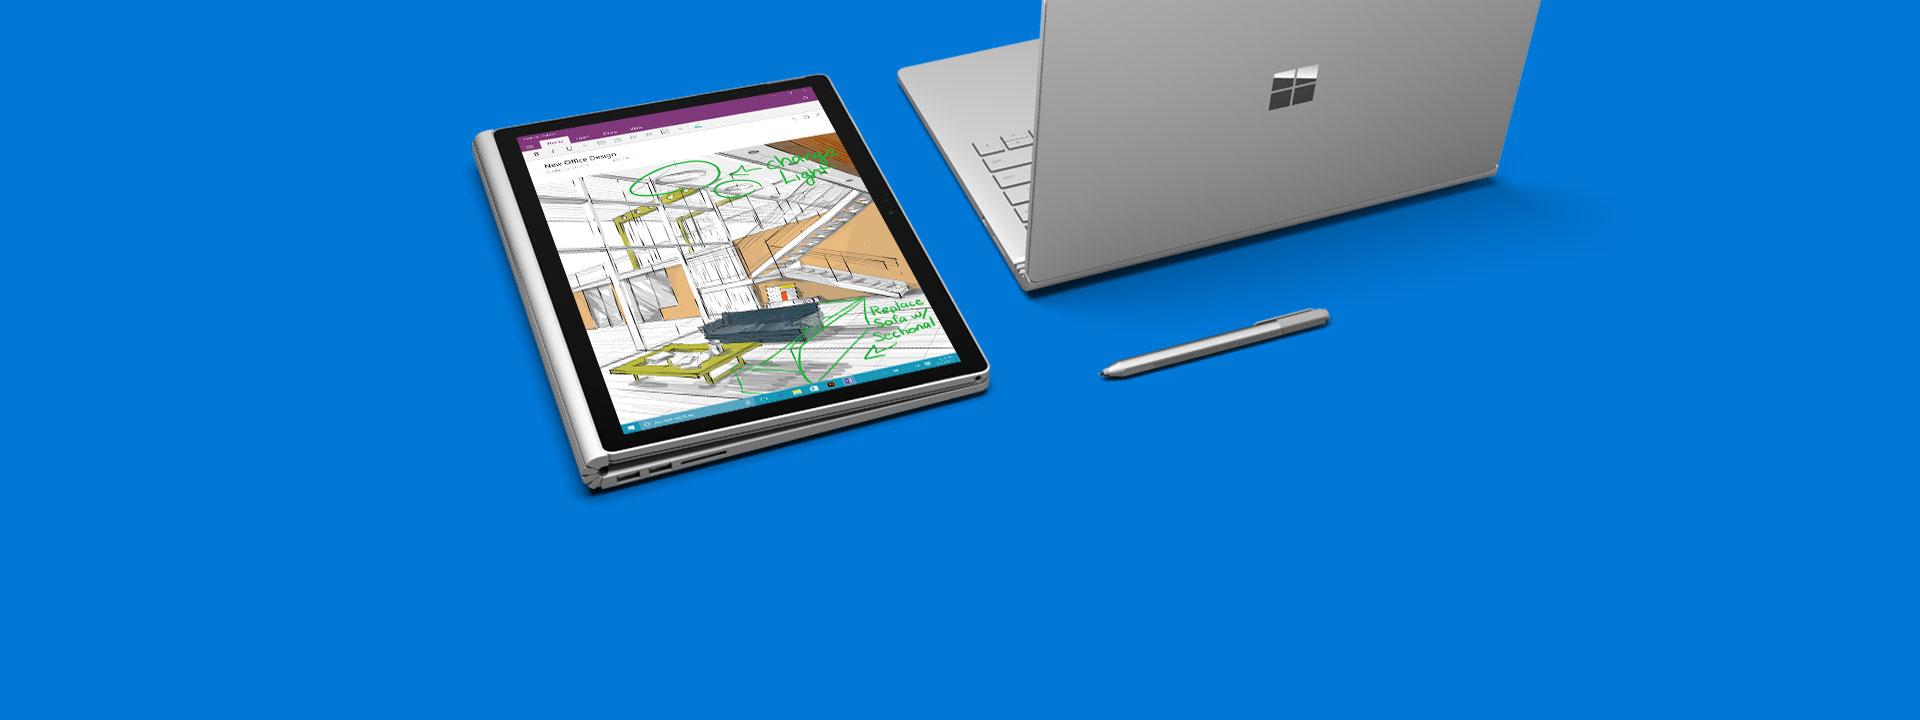 详细了解 Surface Book。